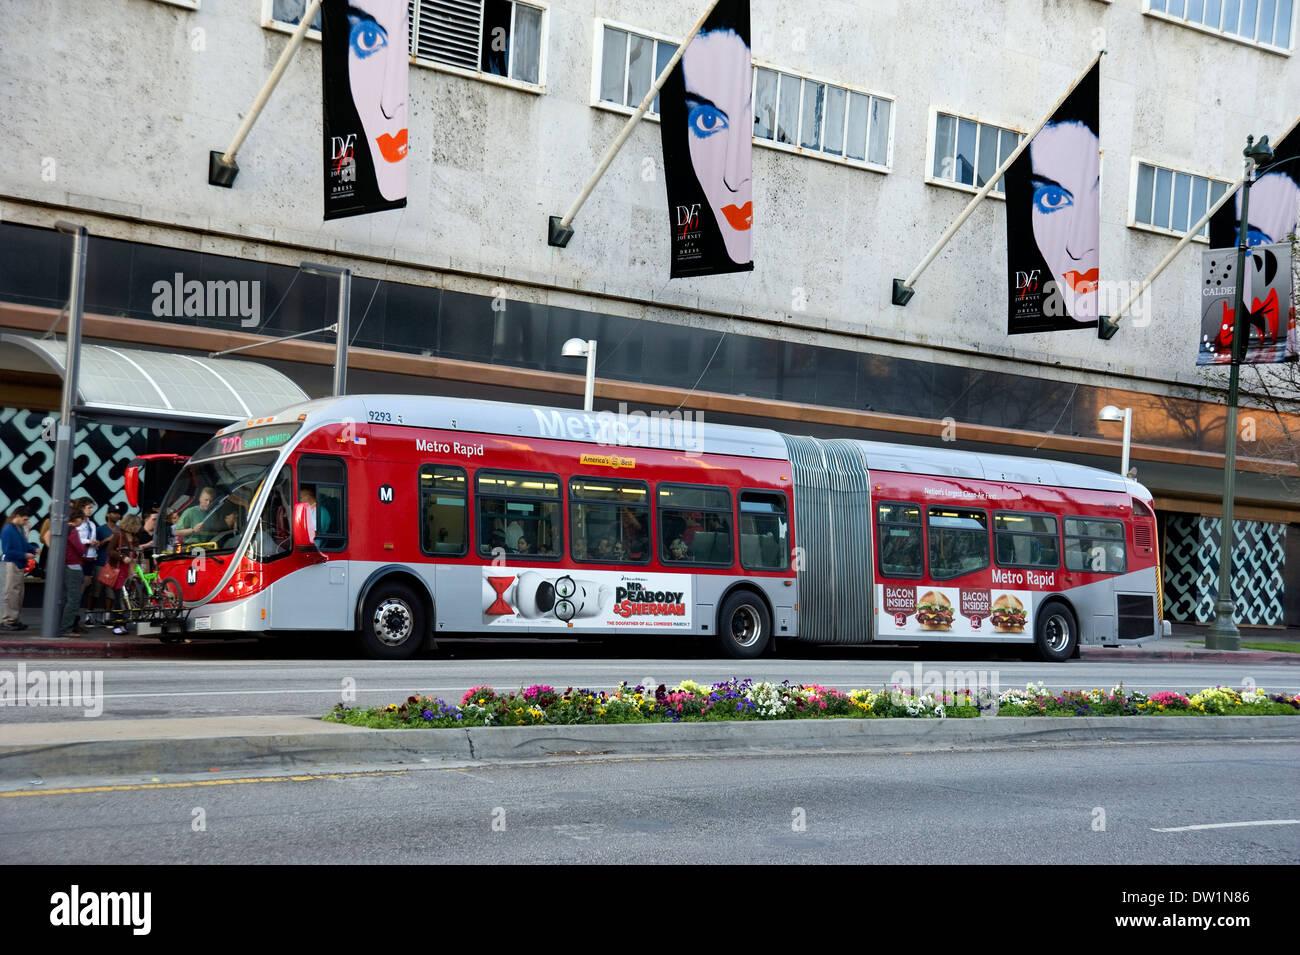 public transportation bus in Los Angeles on Wilshire Blvd. - Stock Image